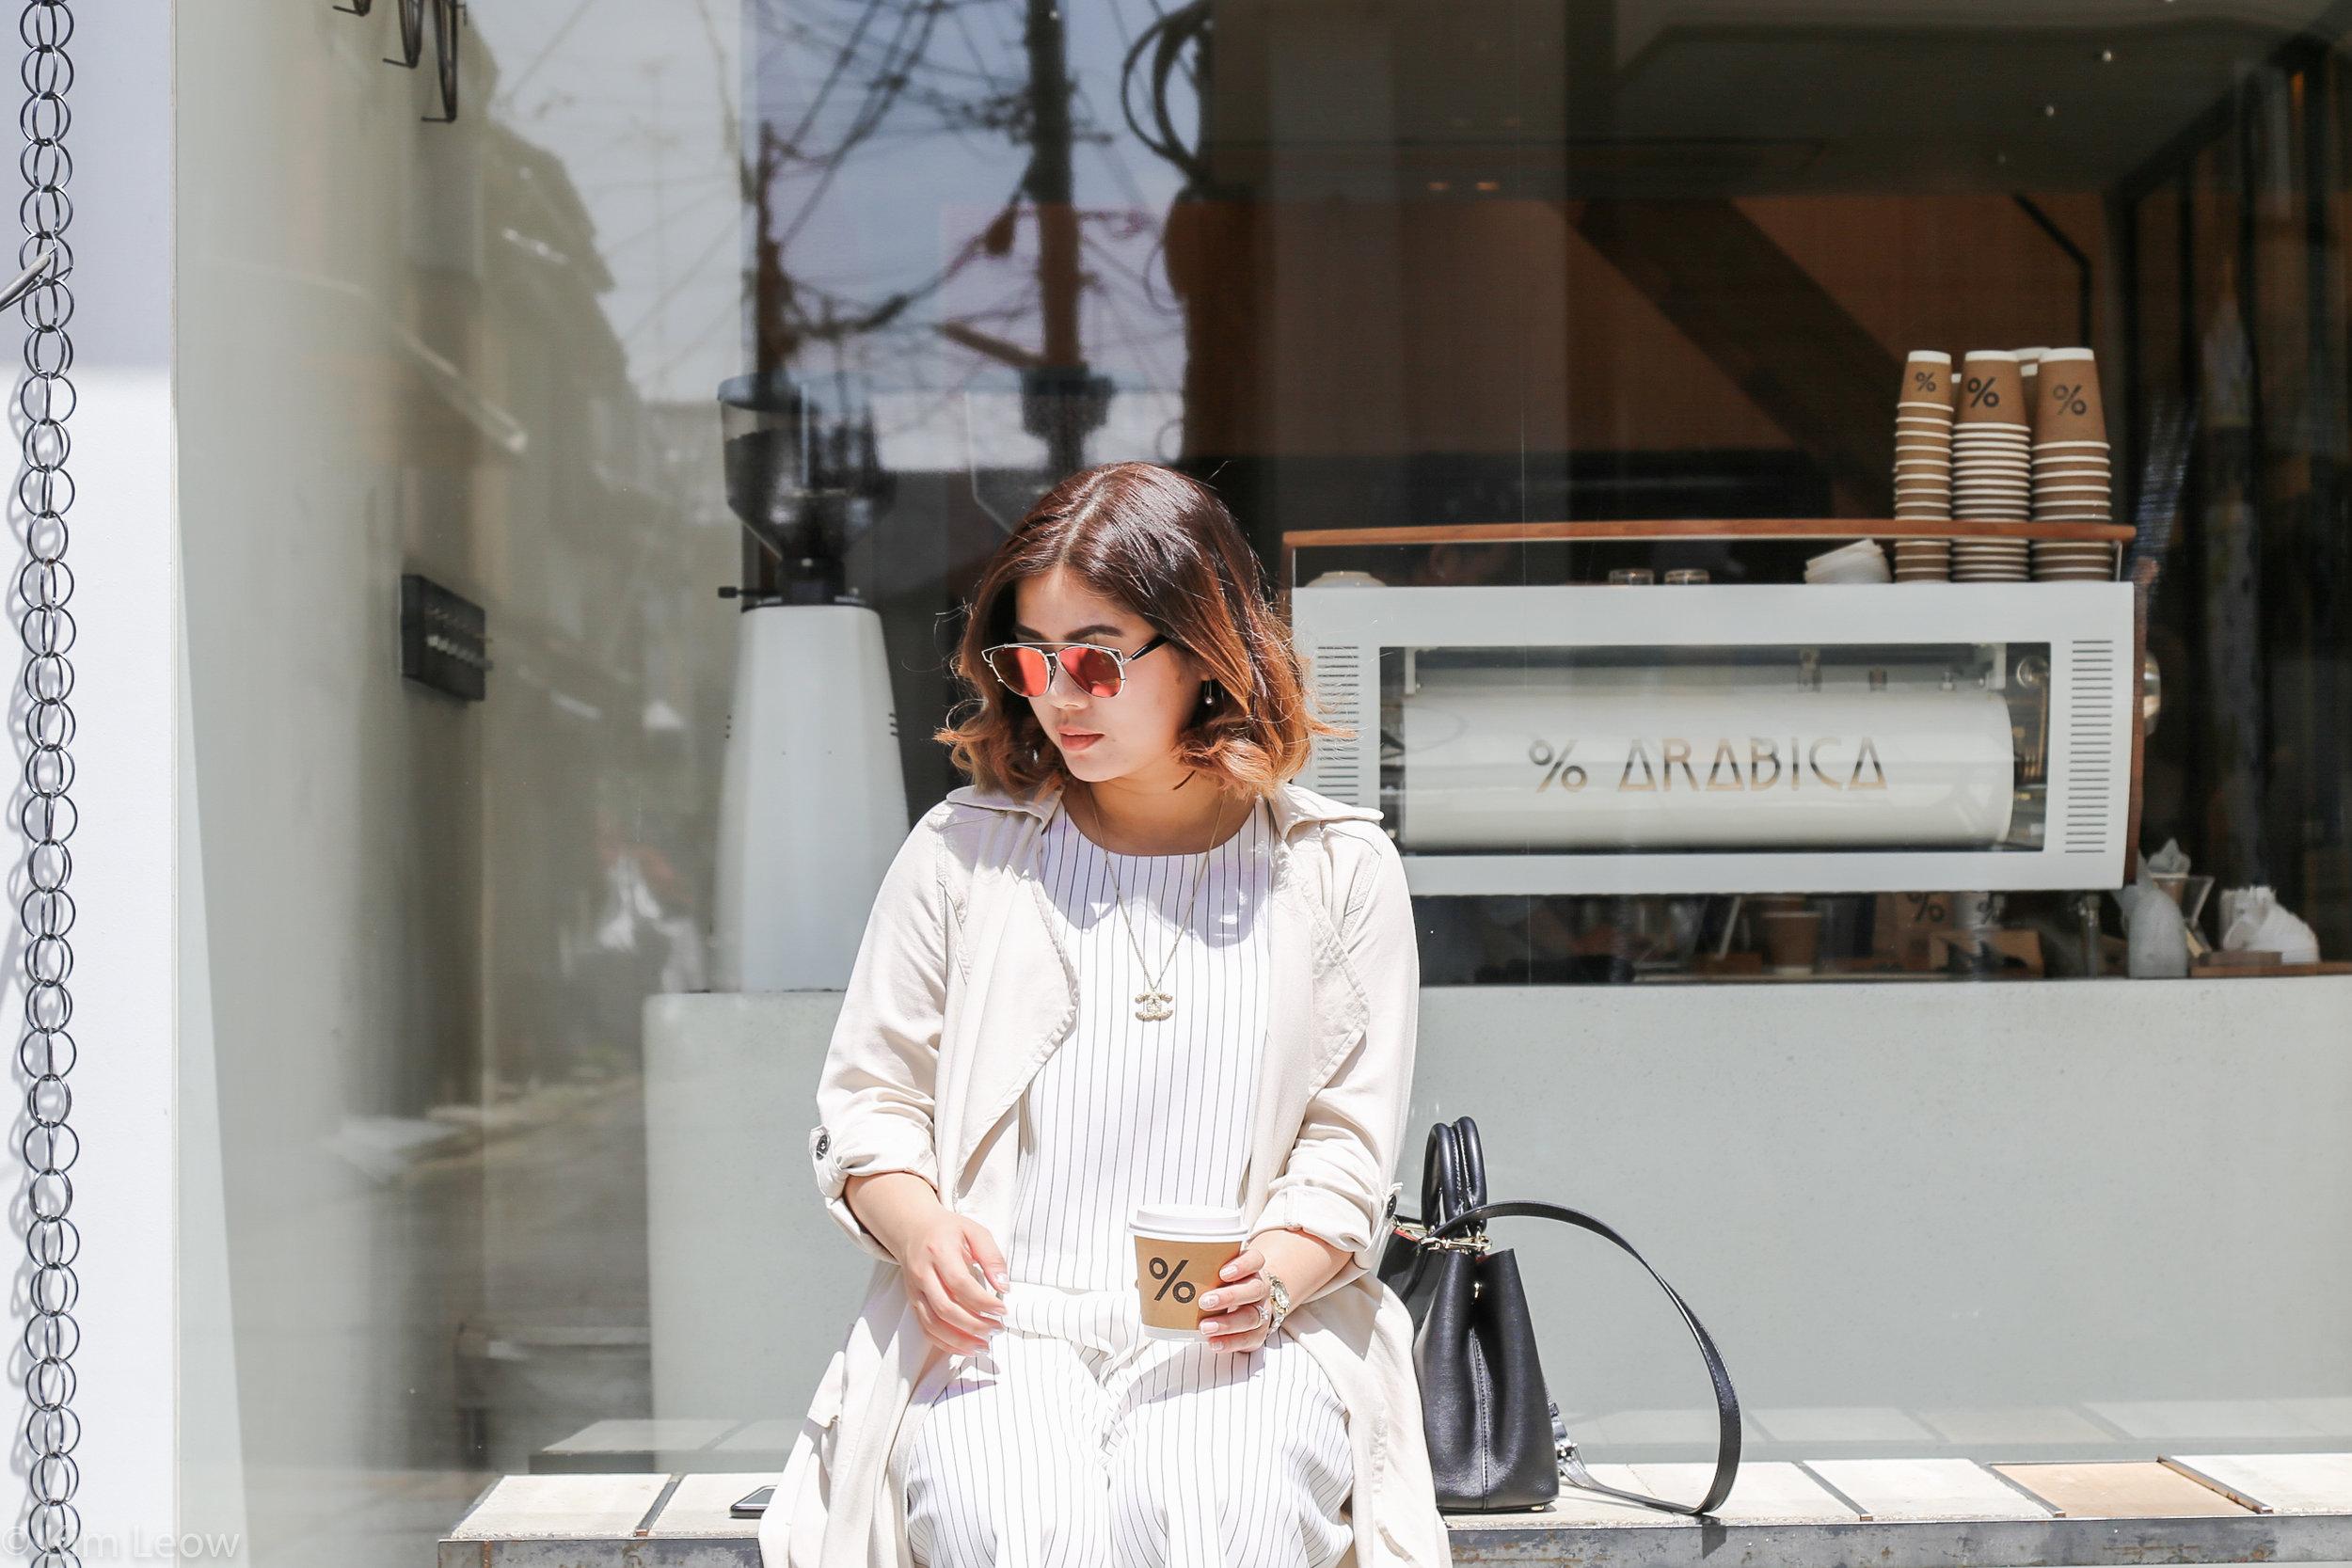 kimleow_arabica_coffee_kyoto_travel-4.jpg